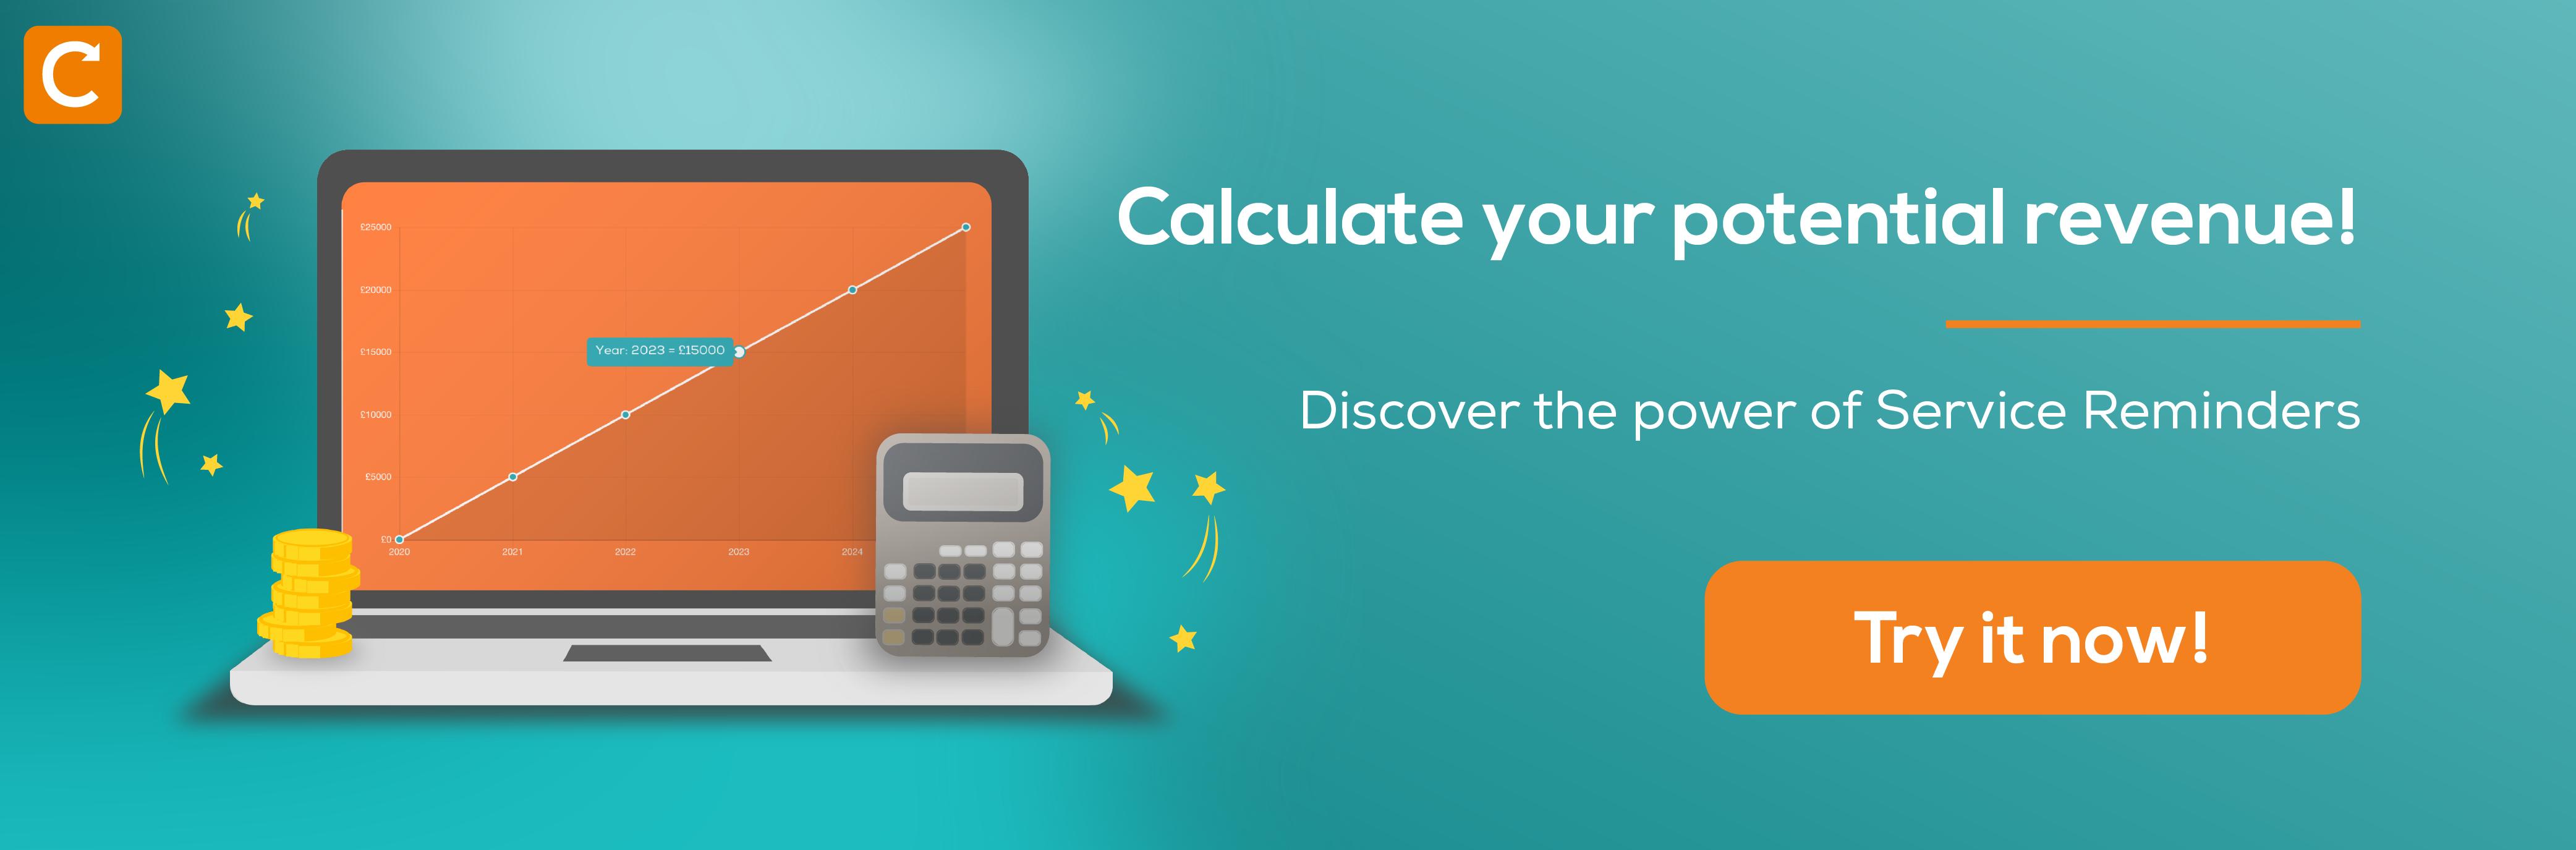 CTA_revenue_calculator-01-1